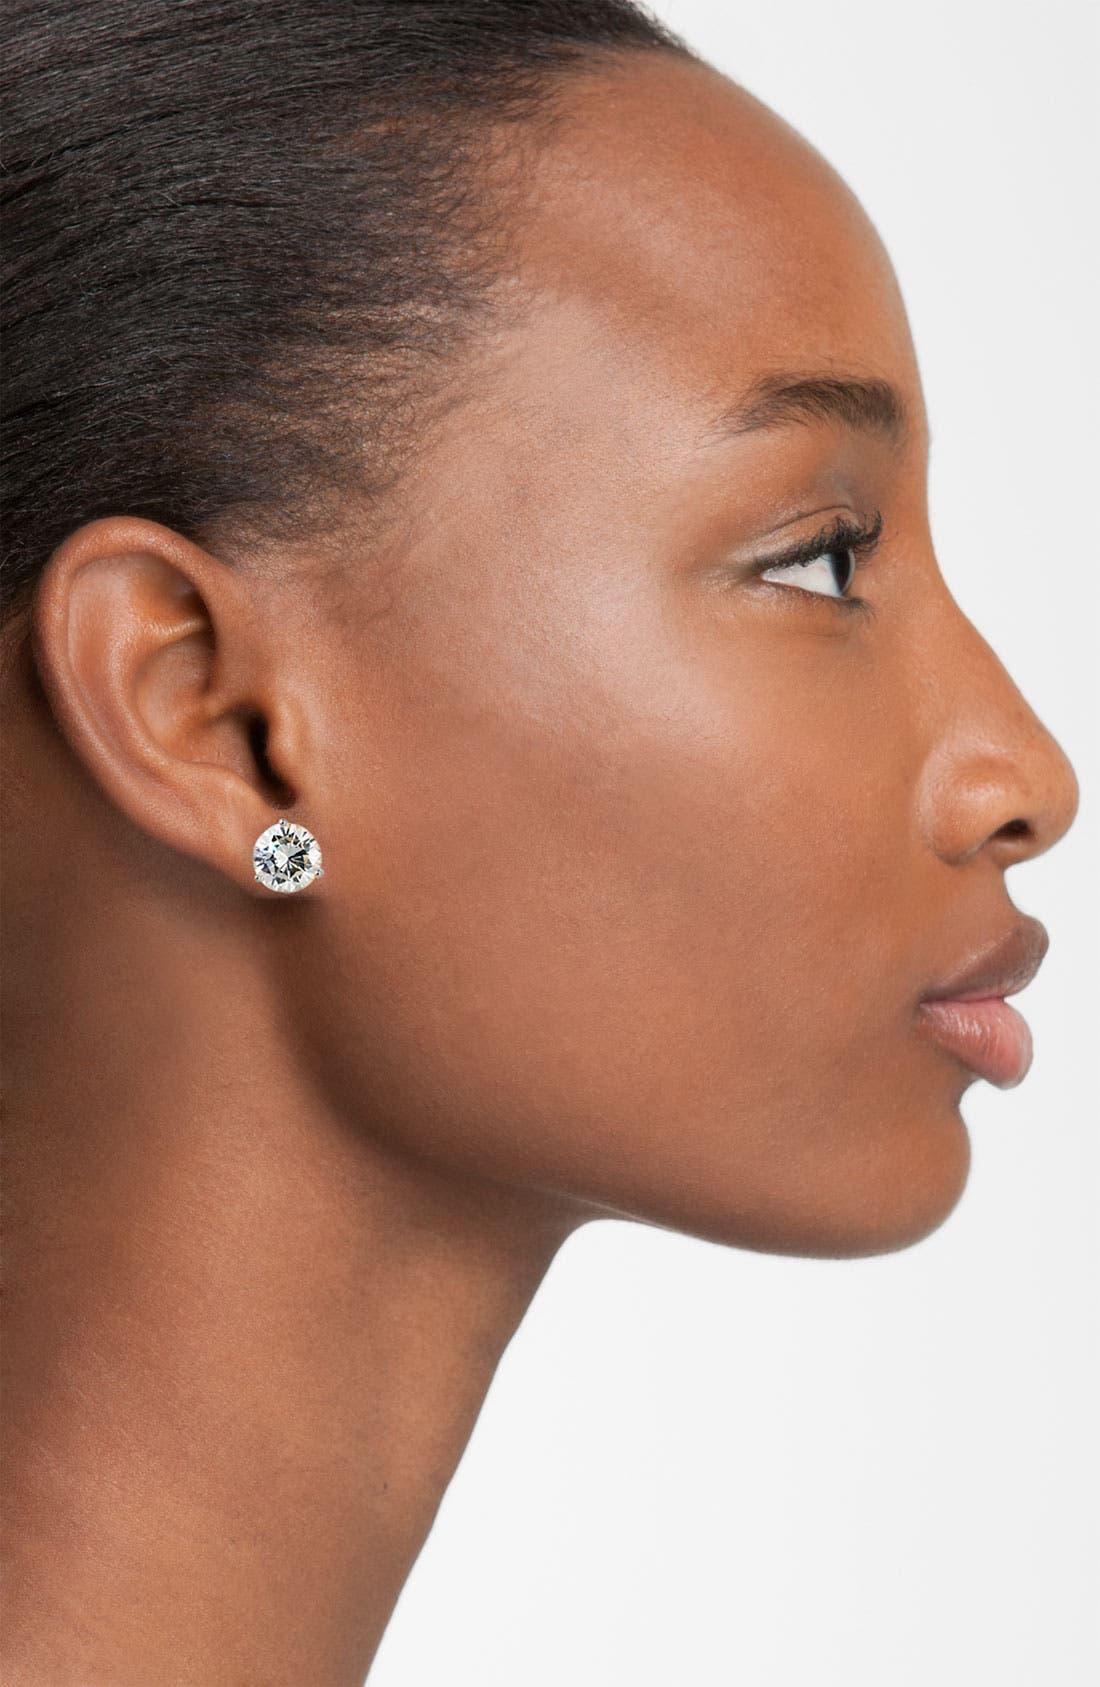 6ct tw Cubic Zirconia Earrings,                             Alternate thumbnail 5, color,                             PLATINUM